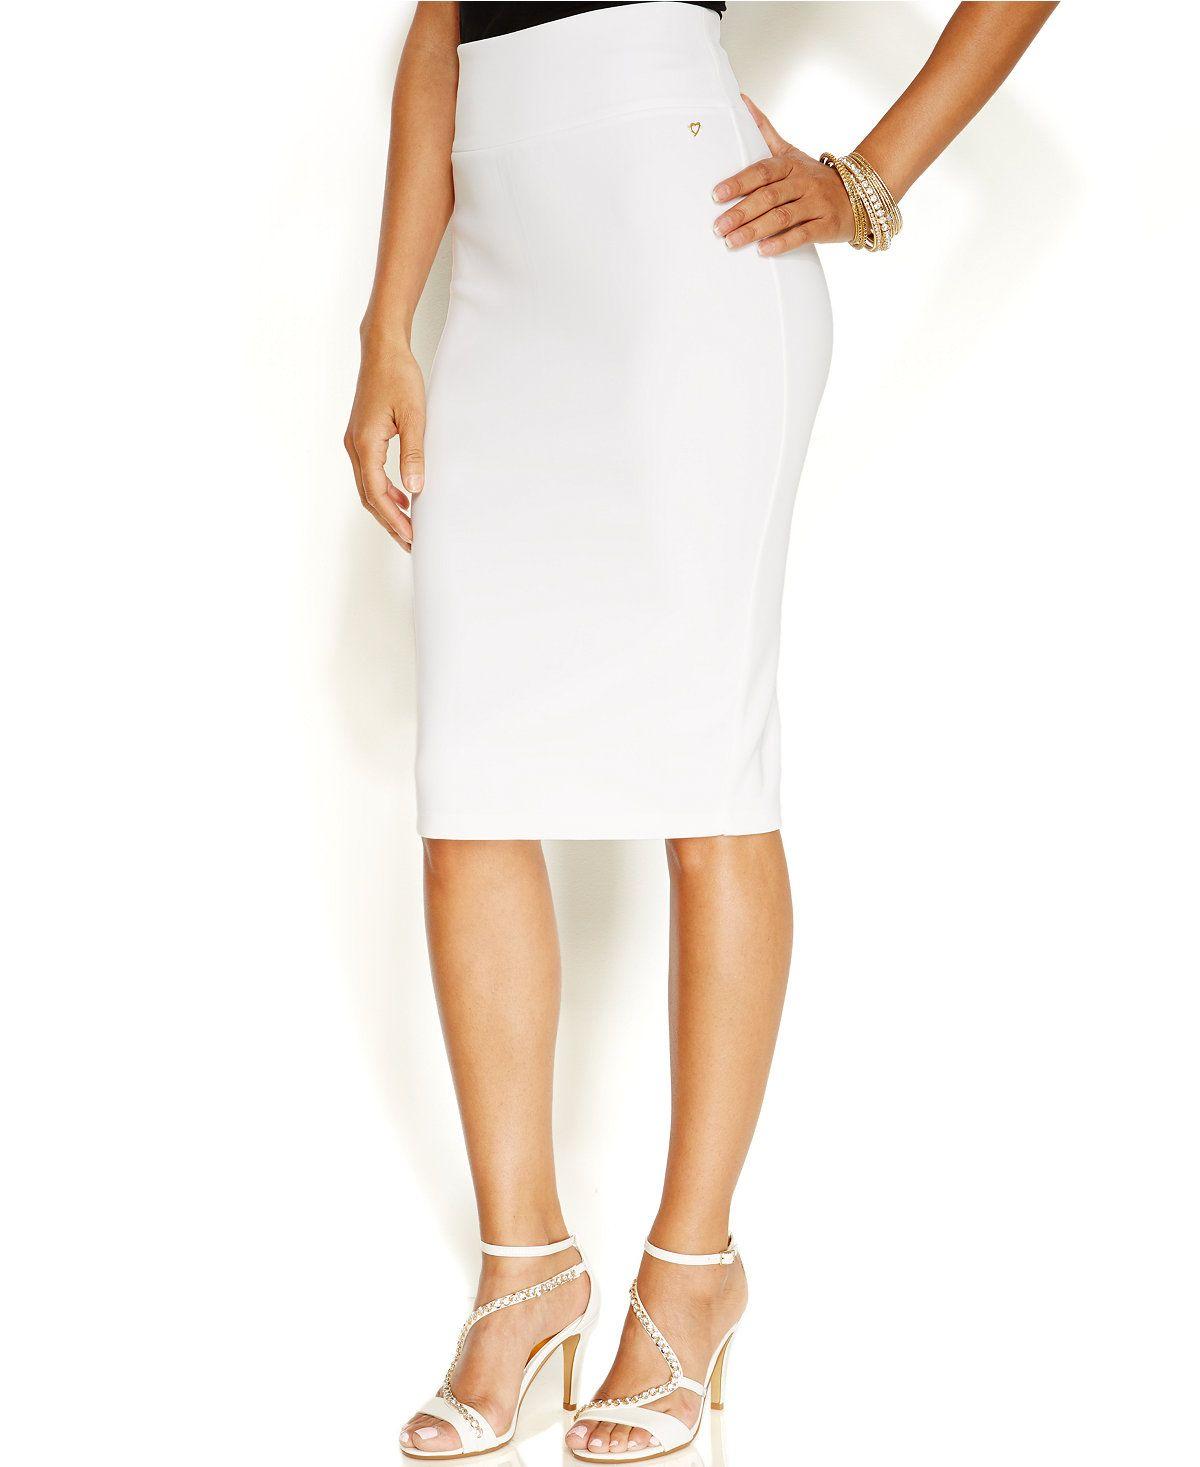 Thalia Sodi Scuba Pencil Skirt, Only at Macy's - Skirts - Women - Macy's